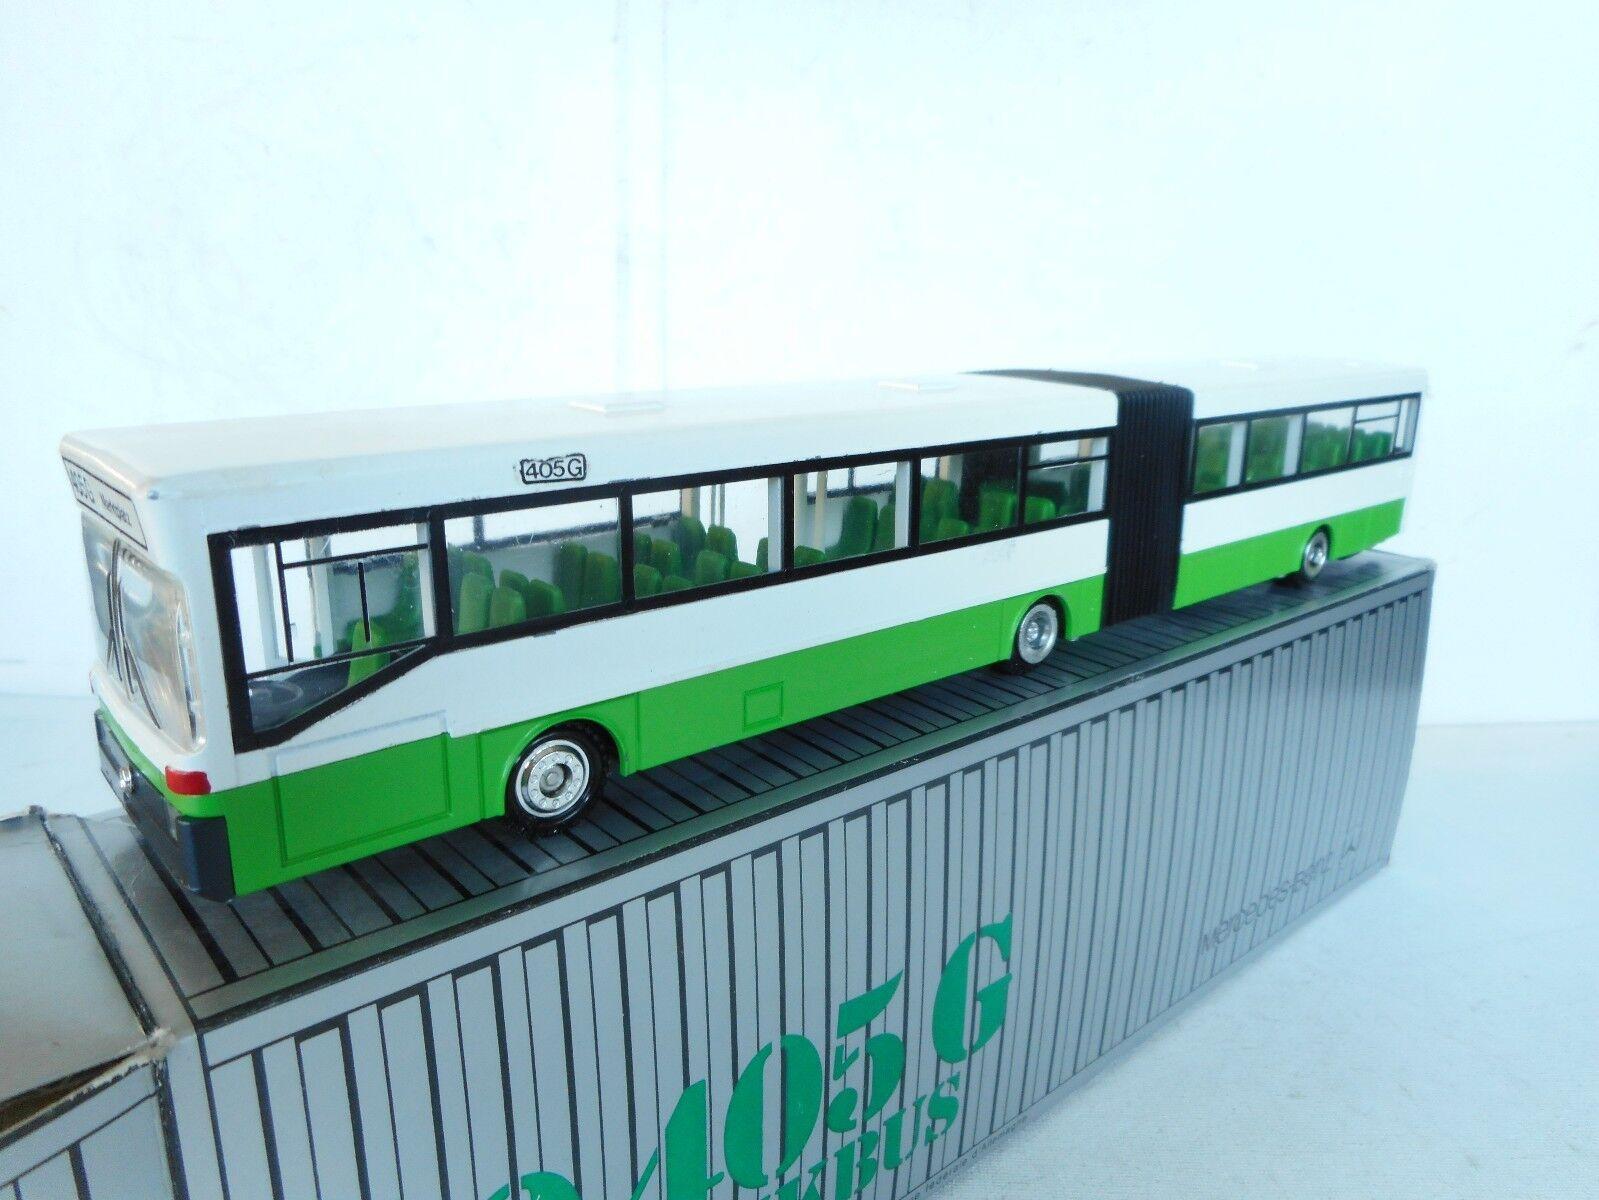 1 50  Conrad  Mercedes Schubgelenkbus-0 405 G Bus Marktplatz verde1 50 N M  Box